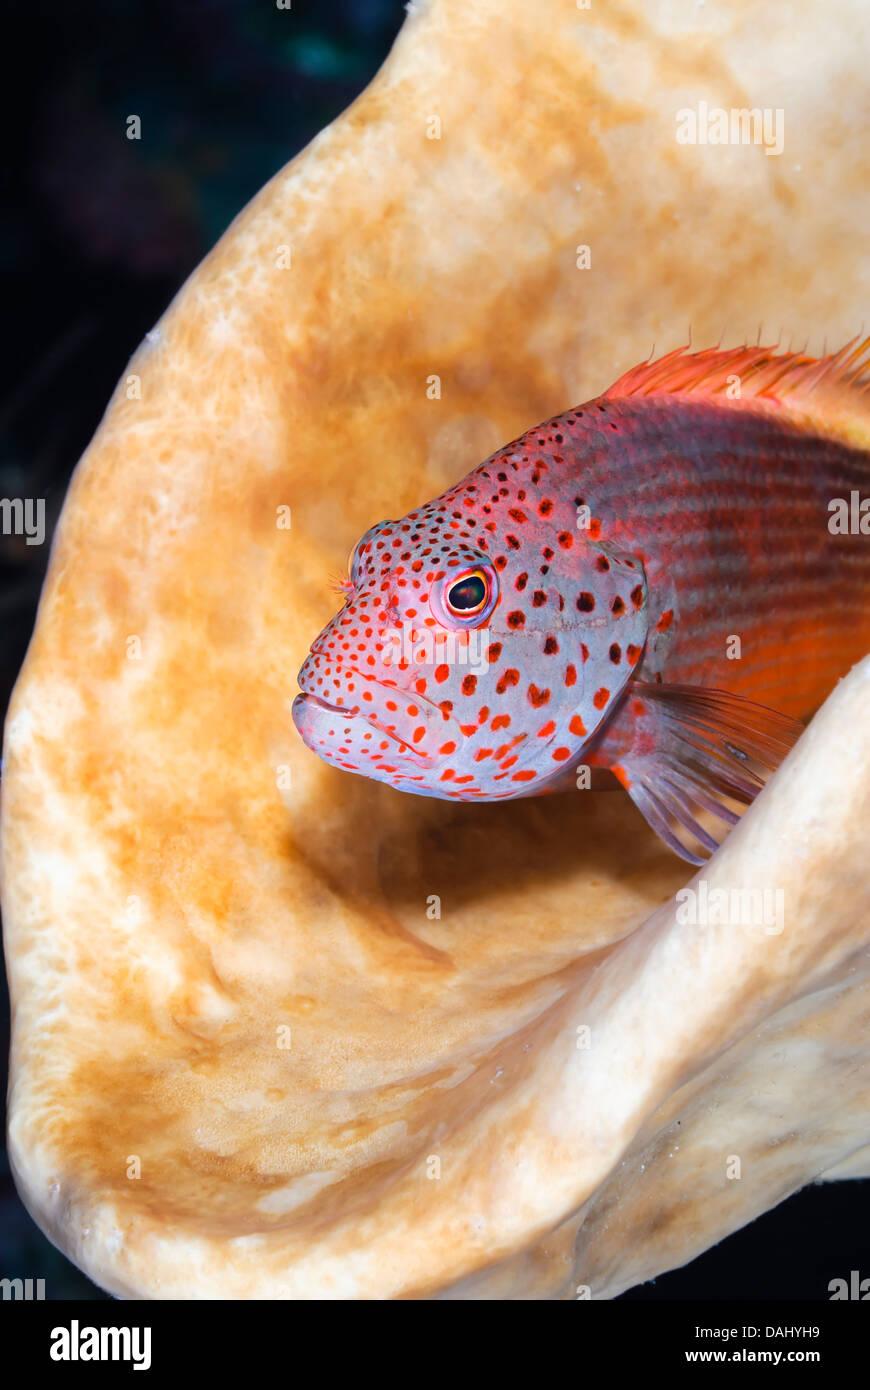 Freckled hawkfish, Paracirrhites forsteri, Bunaken Marine Park, North Sulawesi, Indonesia, Pacific - Stock Image